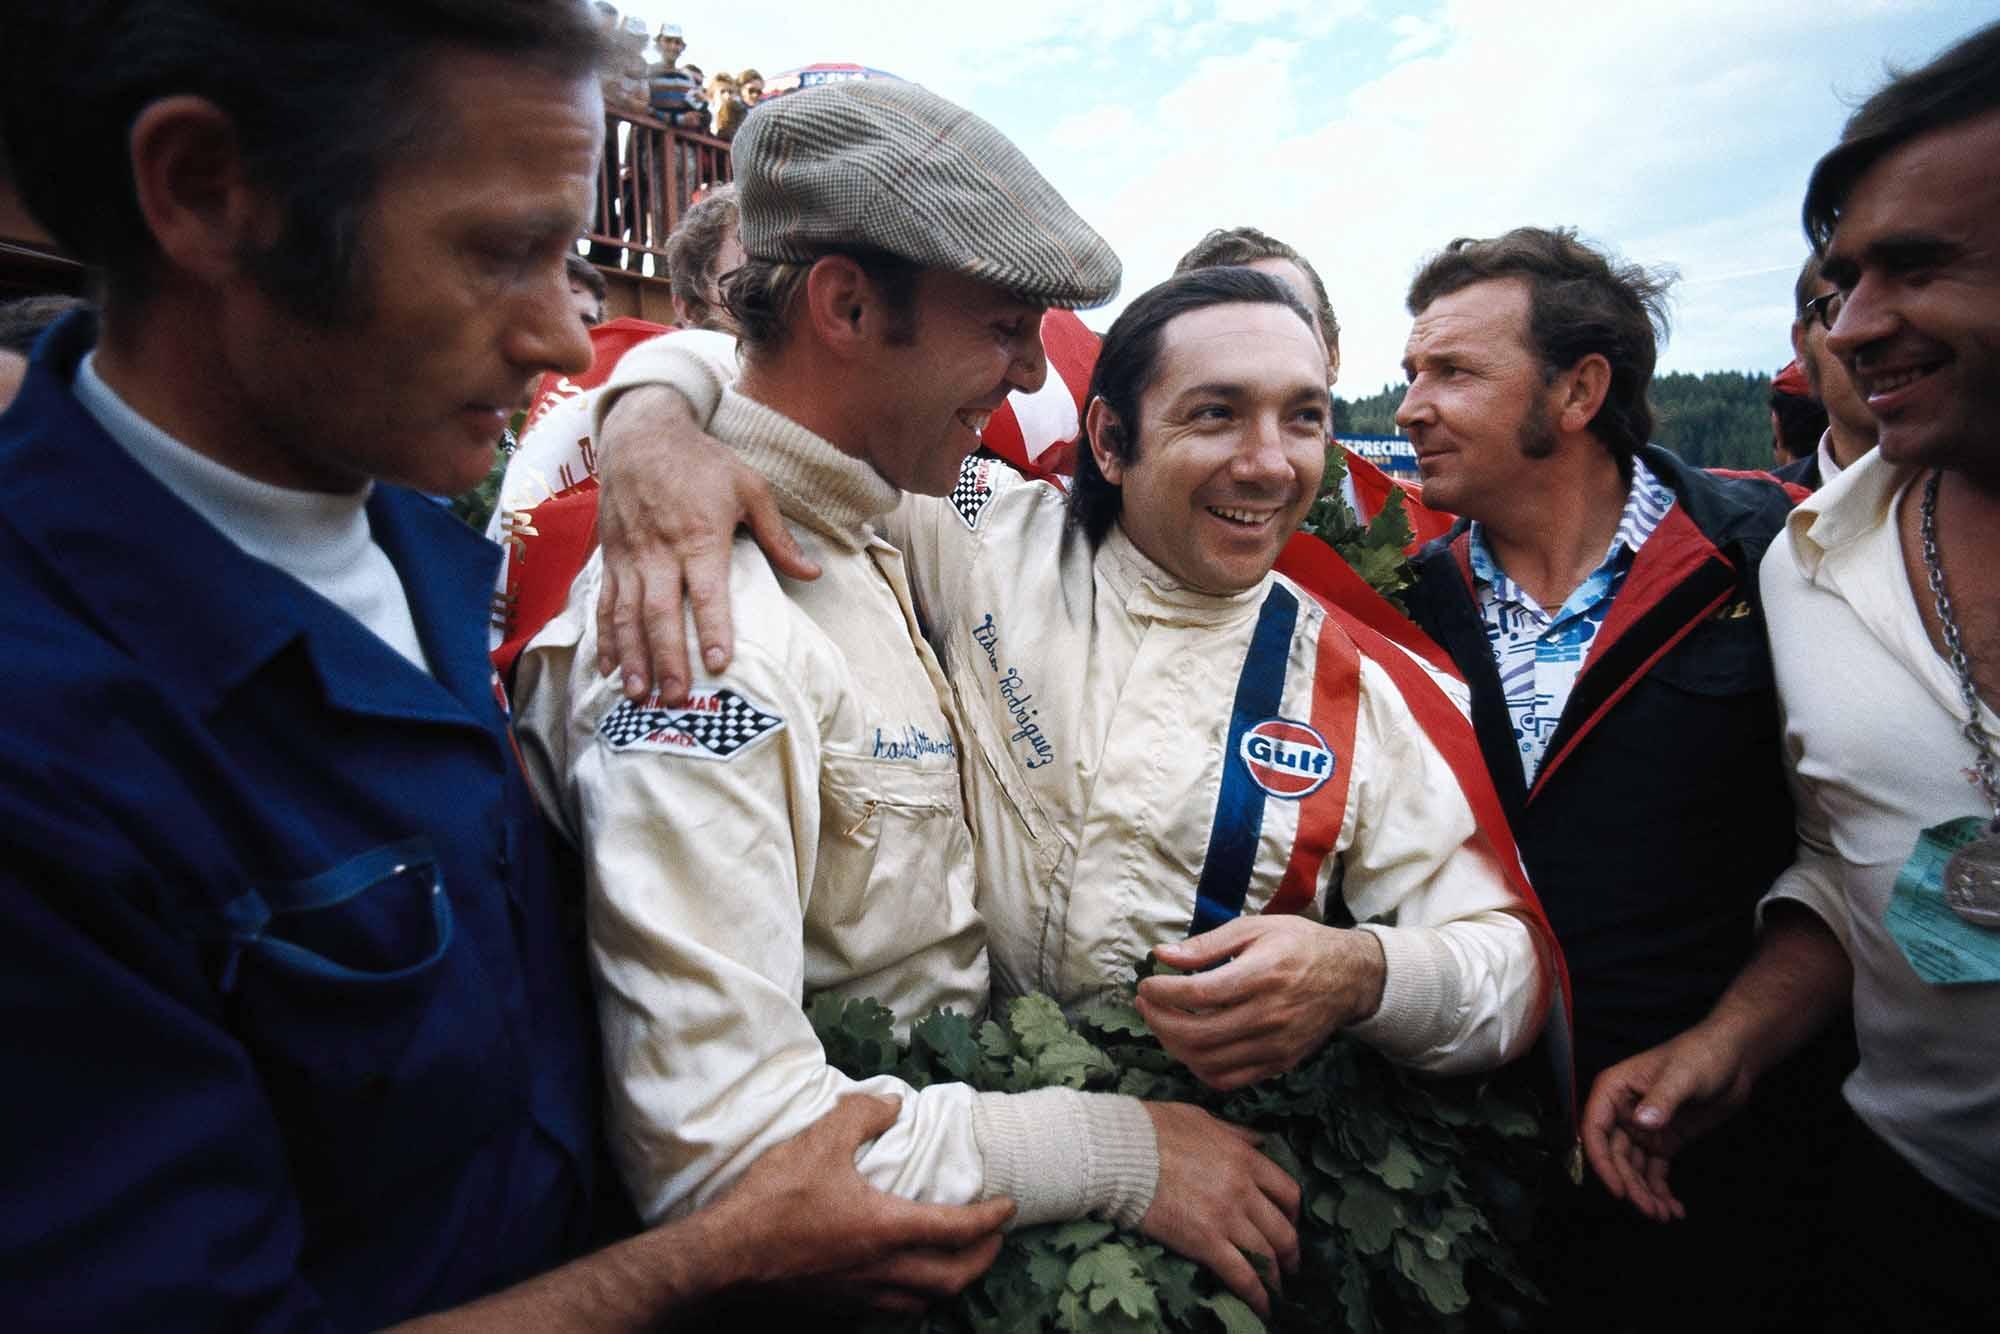 Pedro Rodriguez and Richard Attwood celebrate winning the Austrian 1000km in their Porsche 917